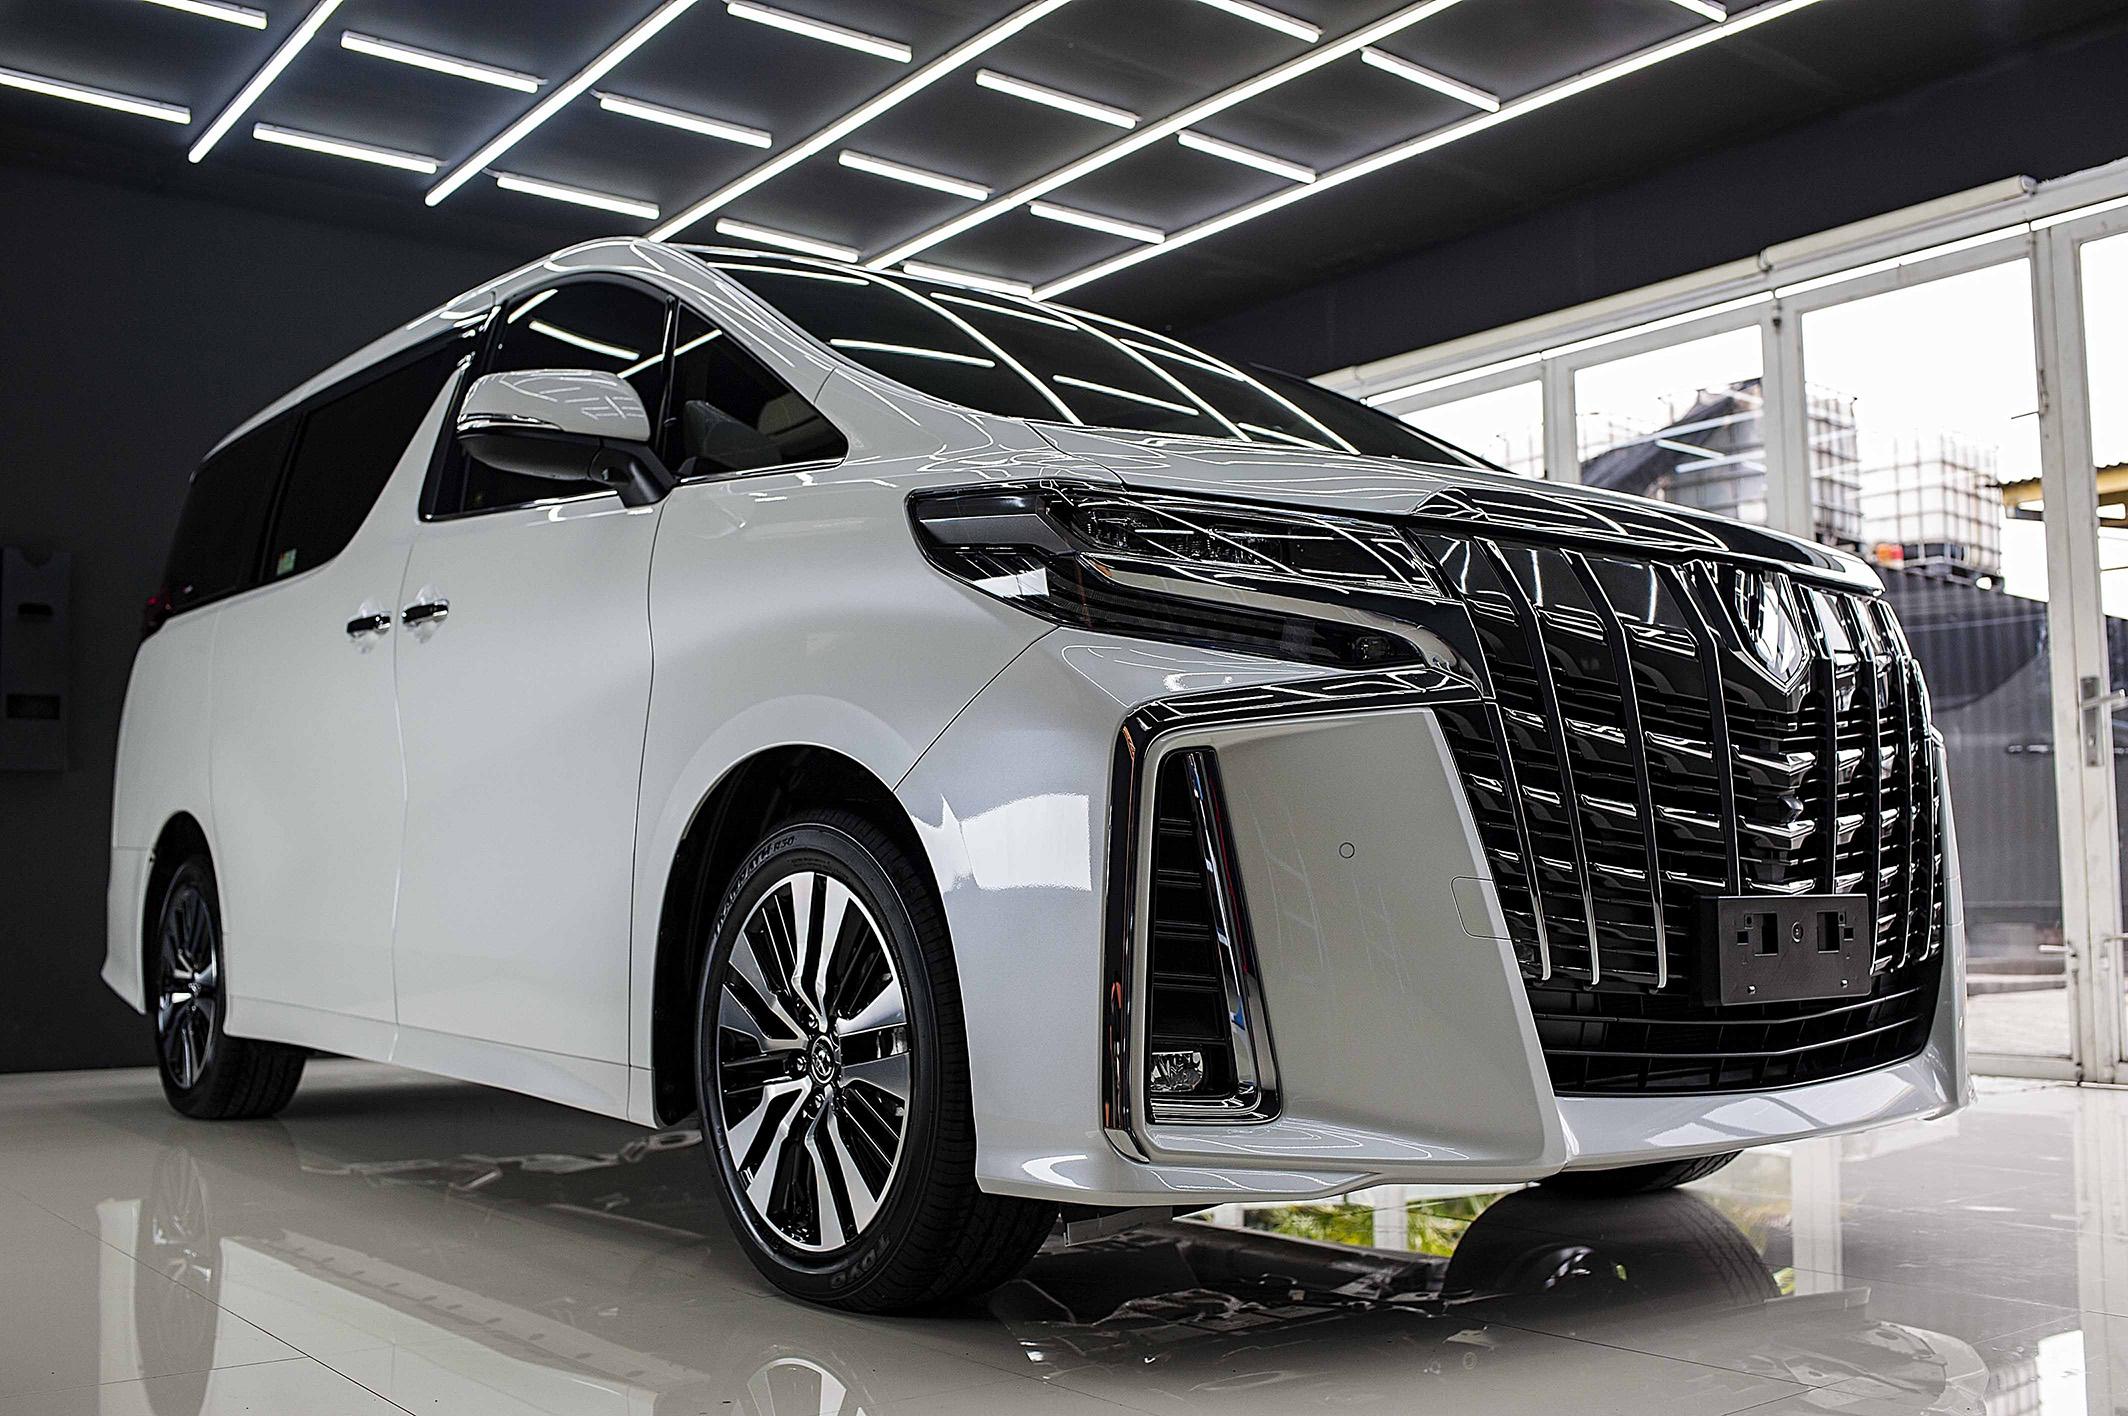 Toyota Alphard for Full CarPro treatment